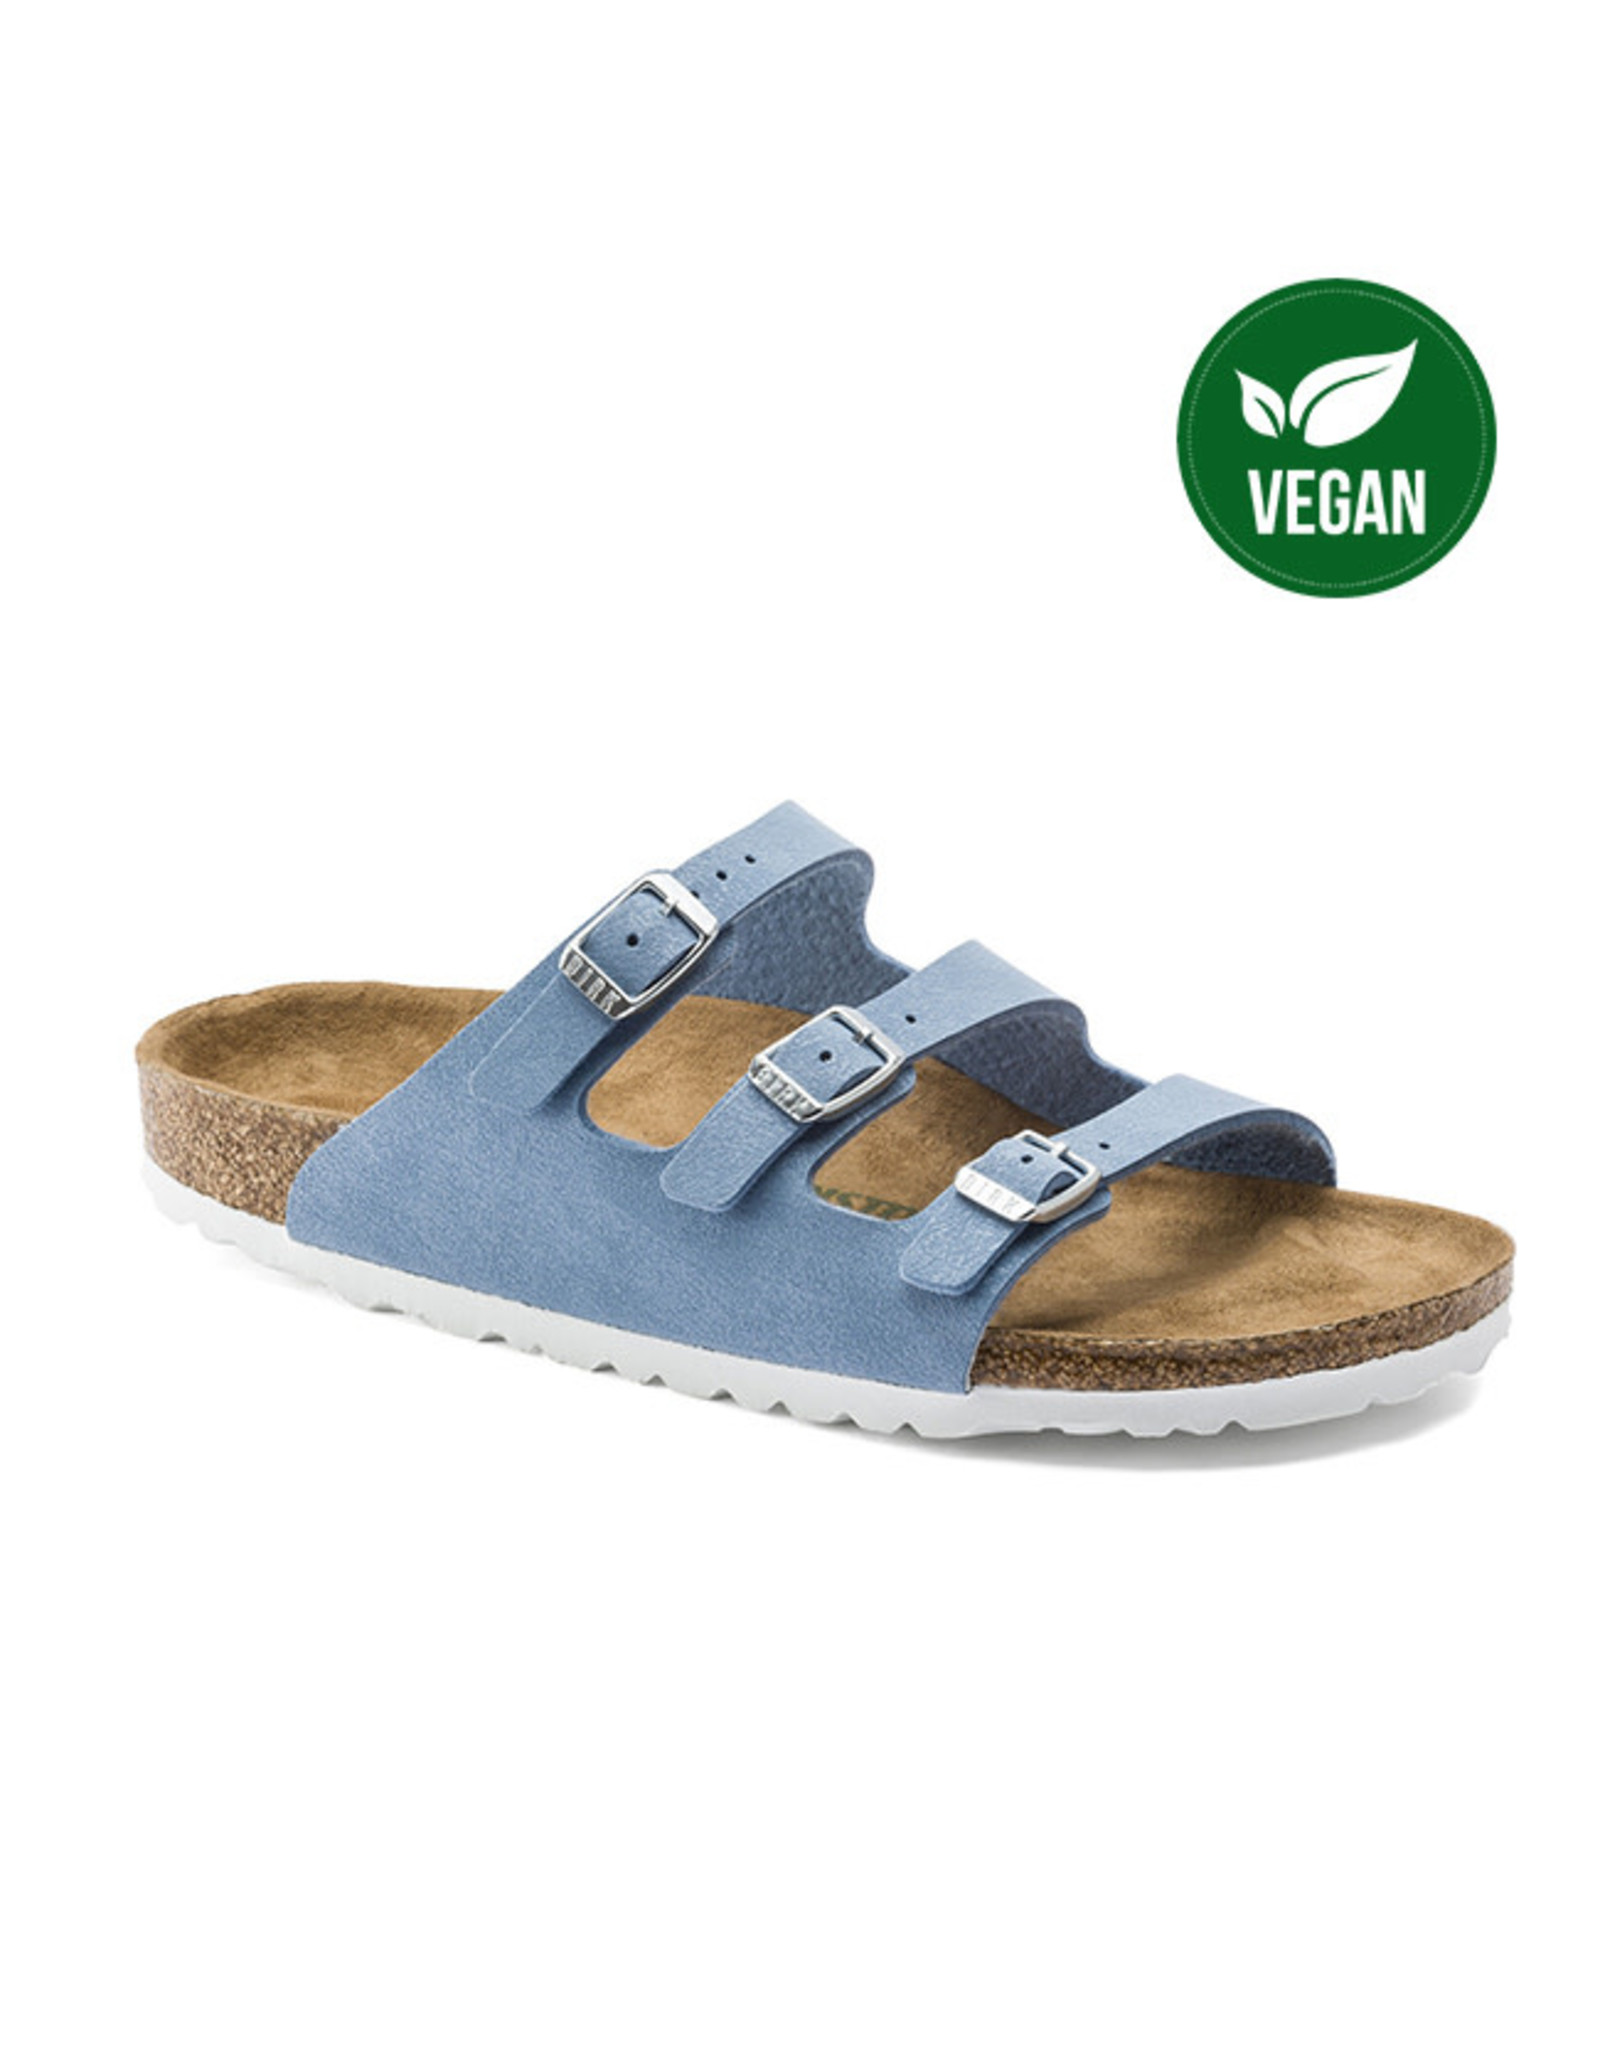 BIRKENSTOCK Florida Fresh Vegan Birkibuc Dove Blue N N FLO-VEBI-N 1018151